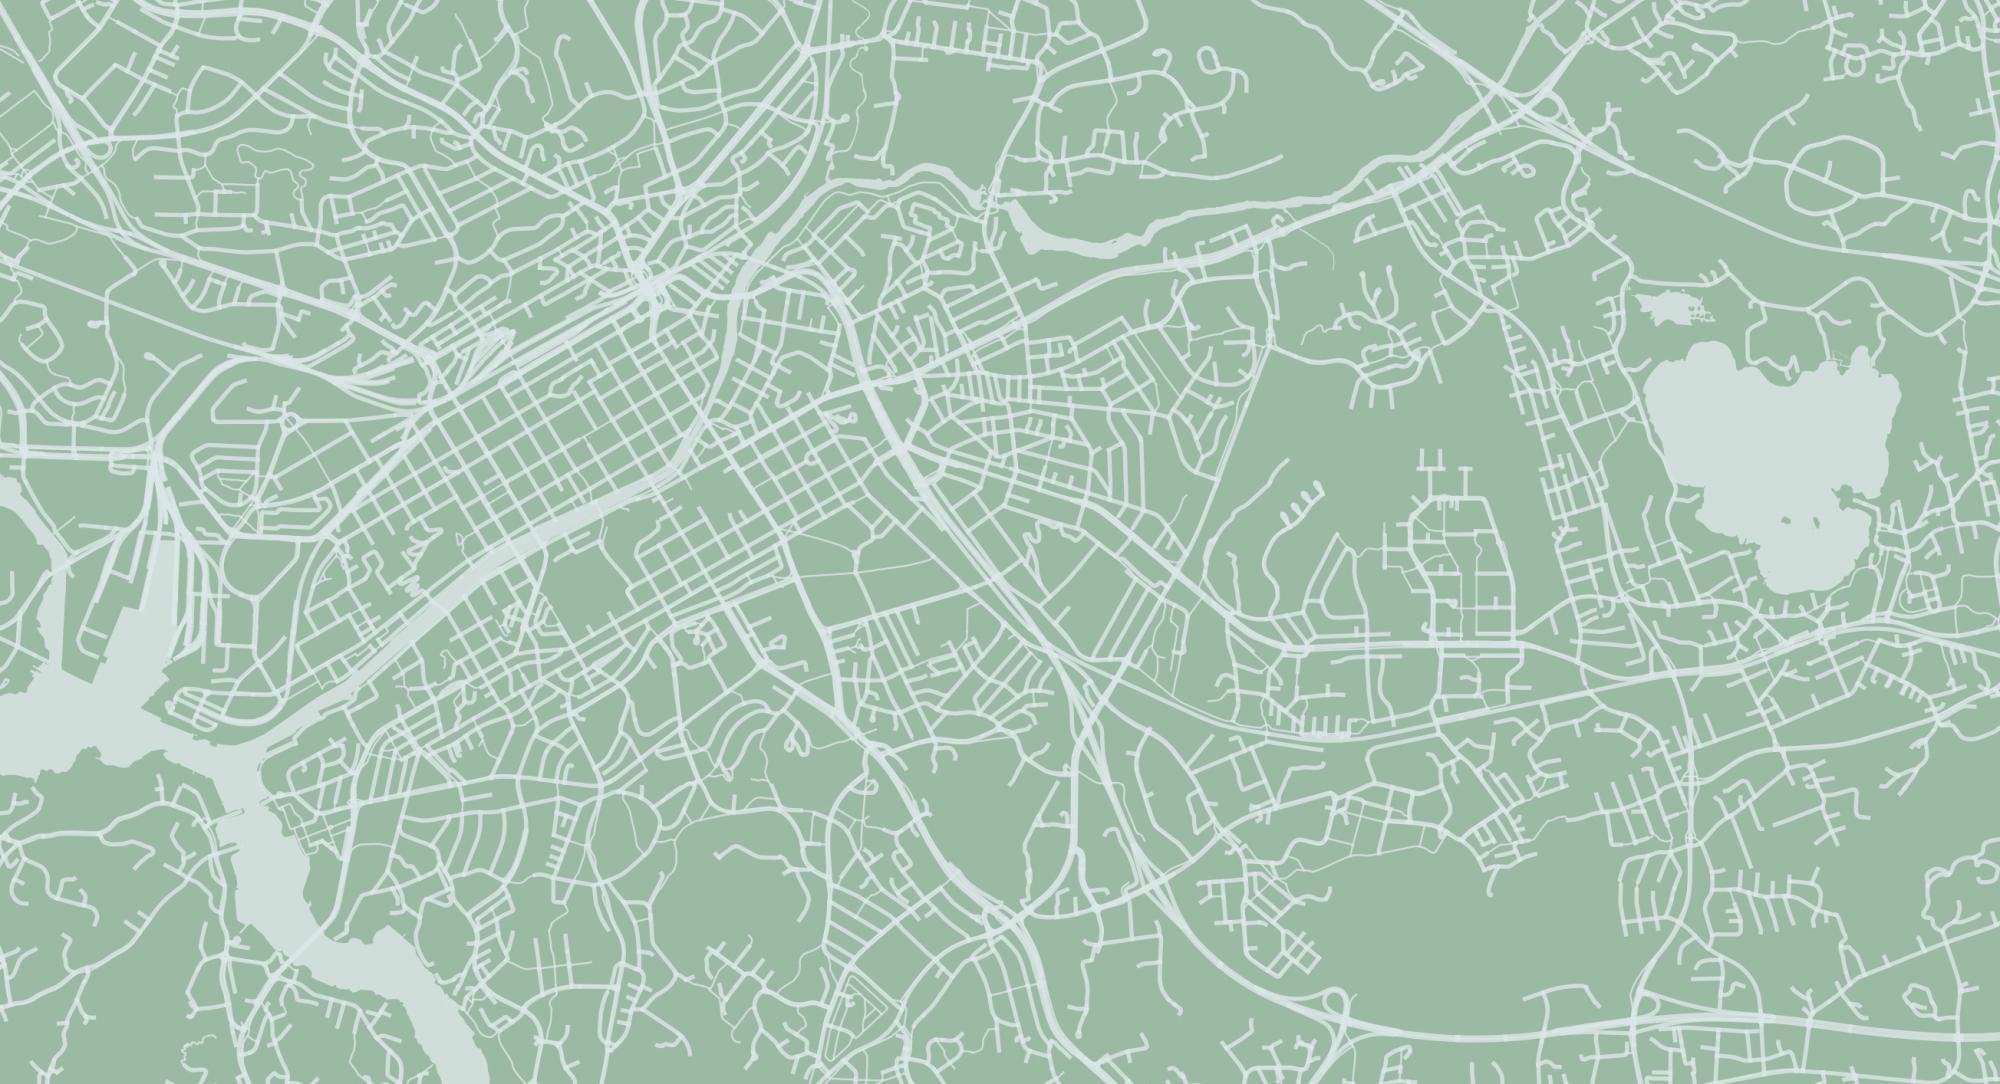 Vilman GIS-pohdiskelua